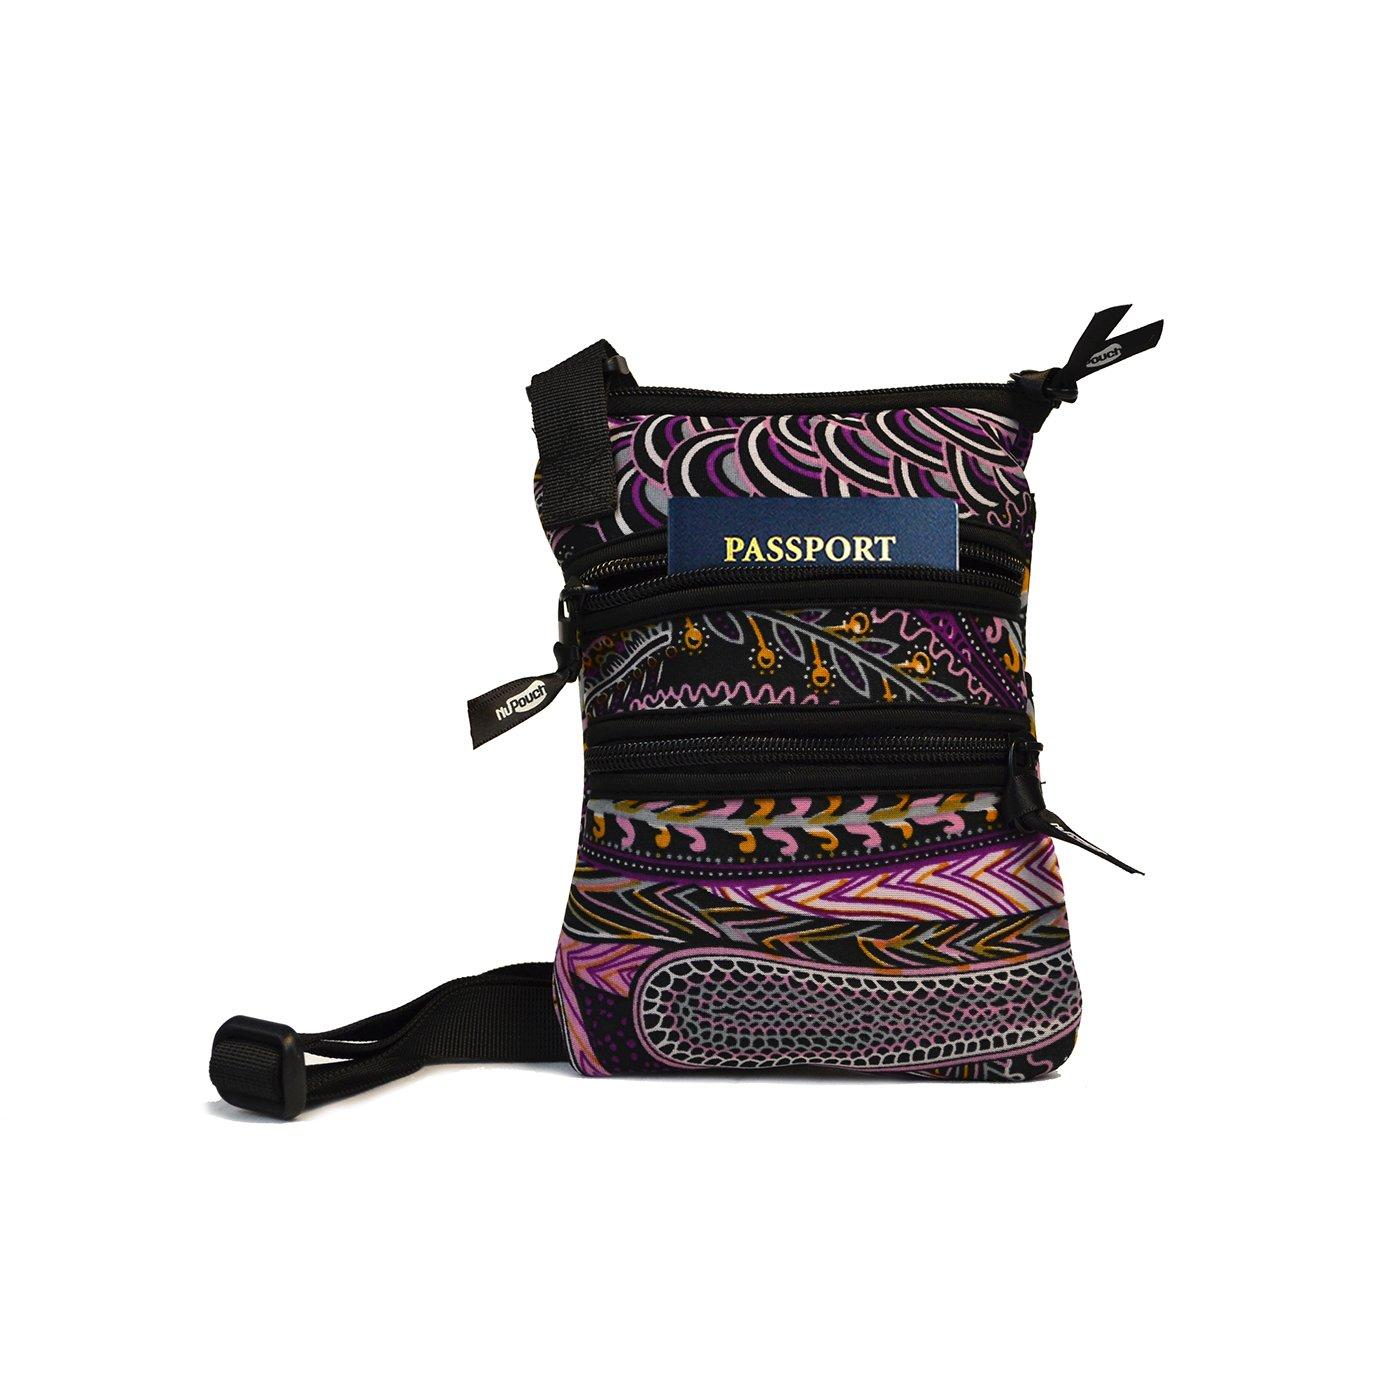 NuPouch Cross Body Purse Women's Handbag Messenger Bag Paisley